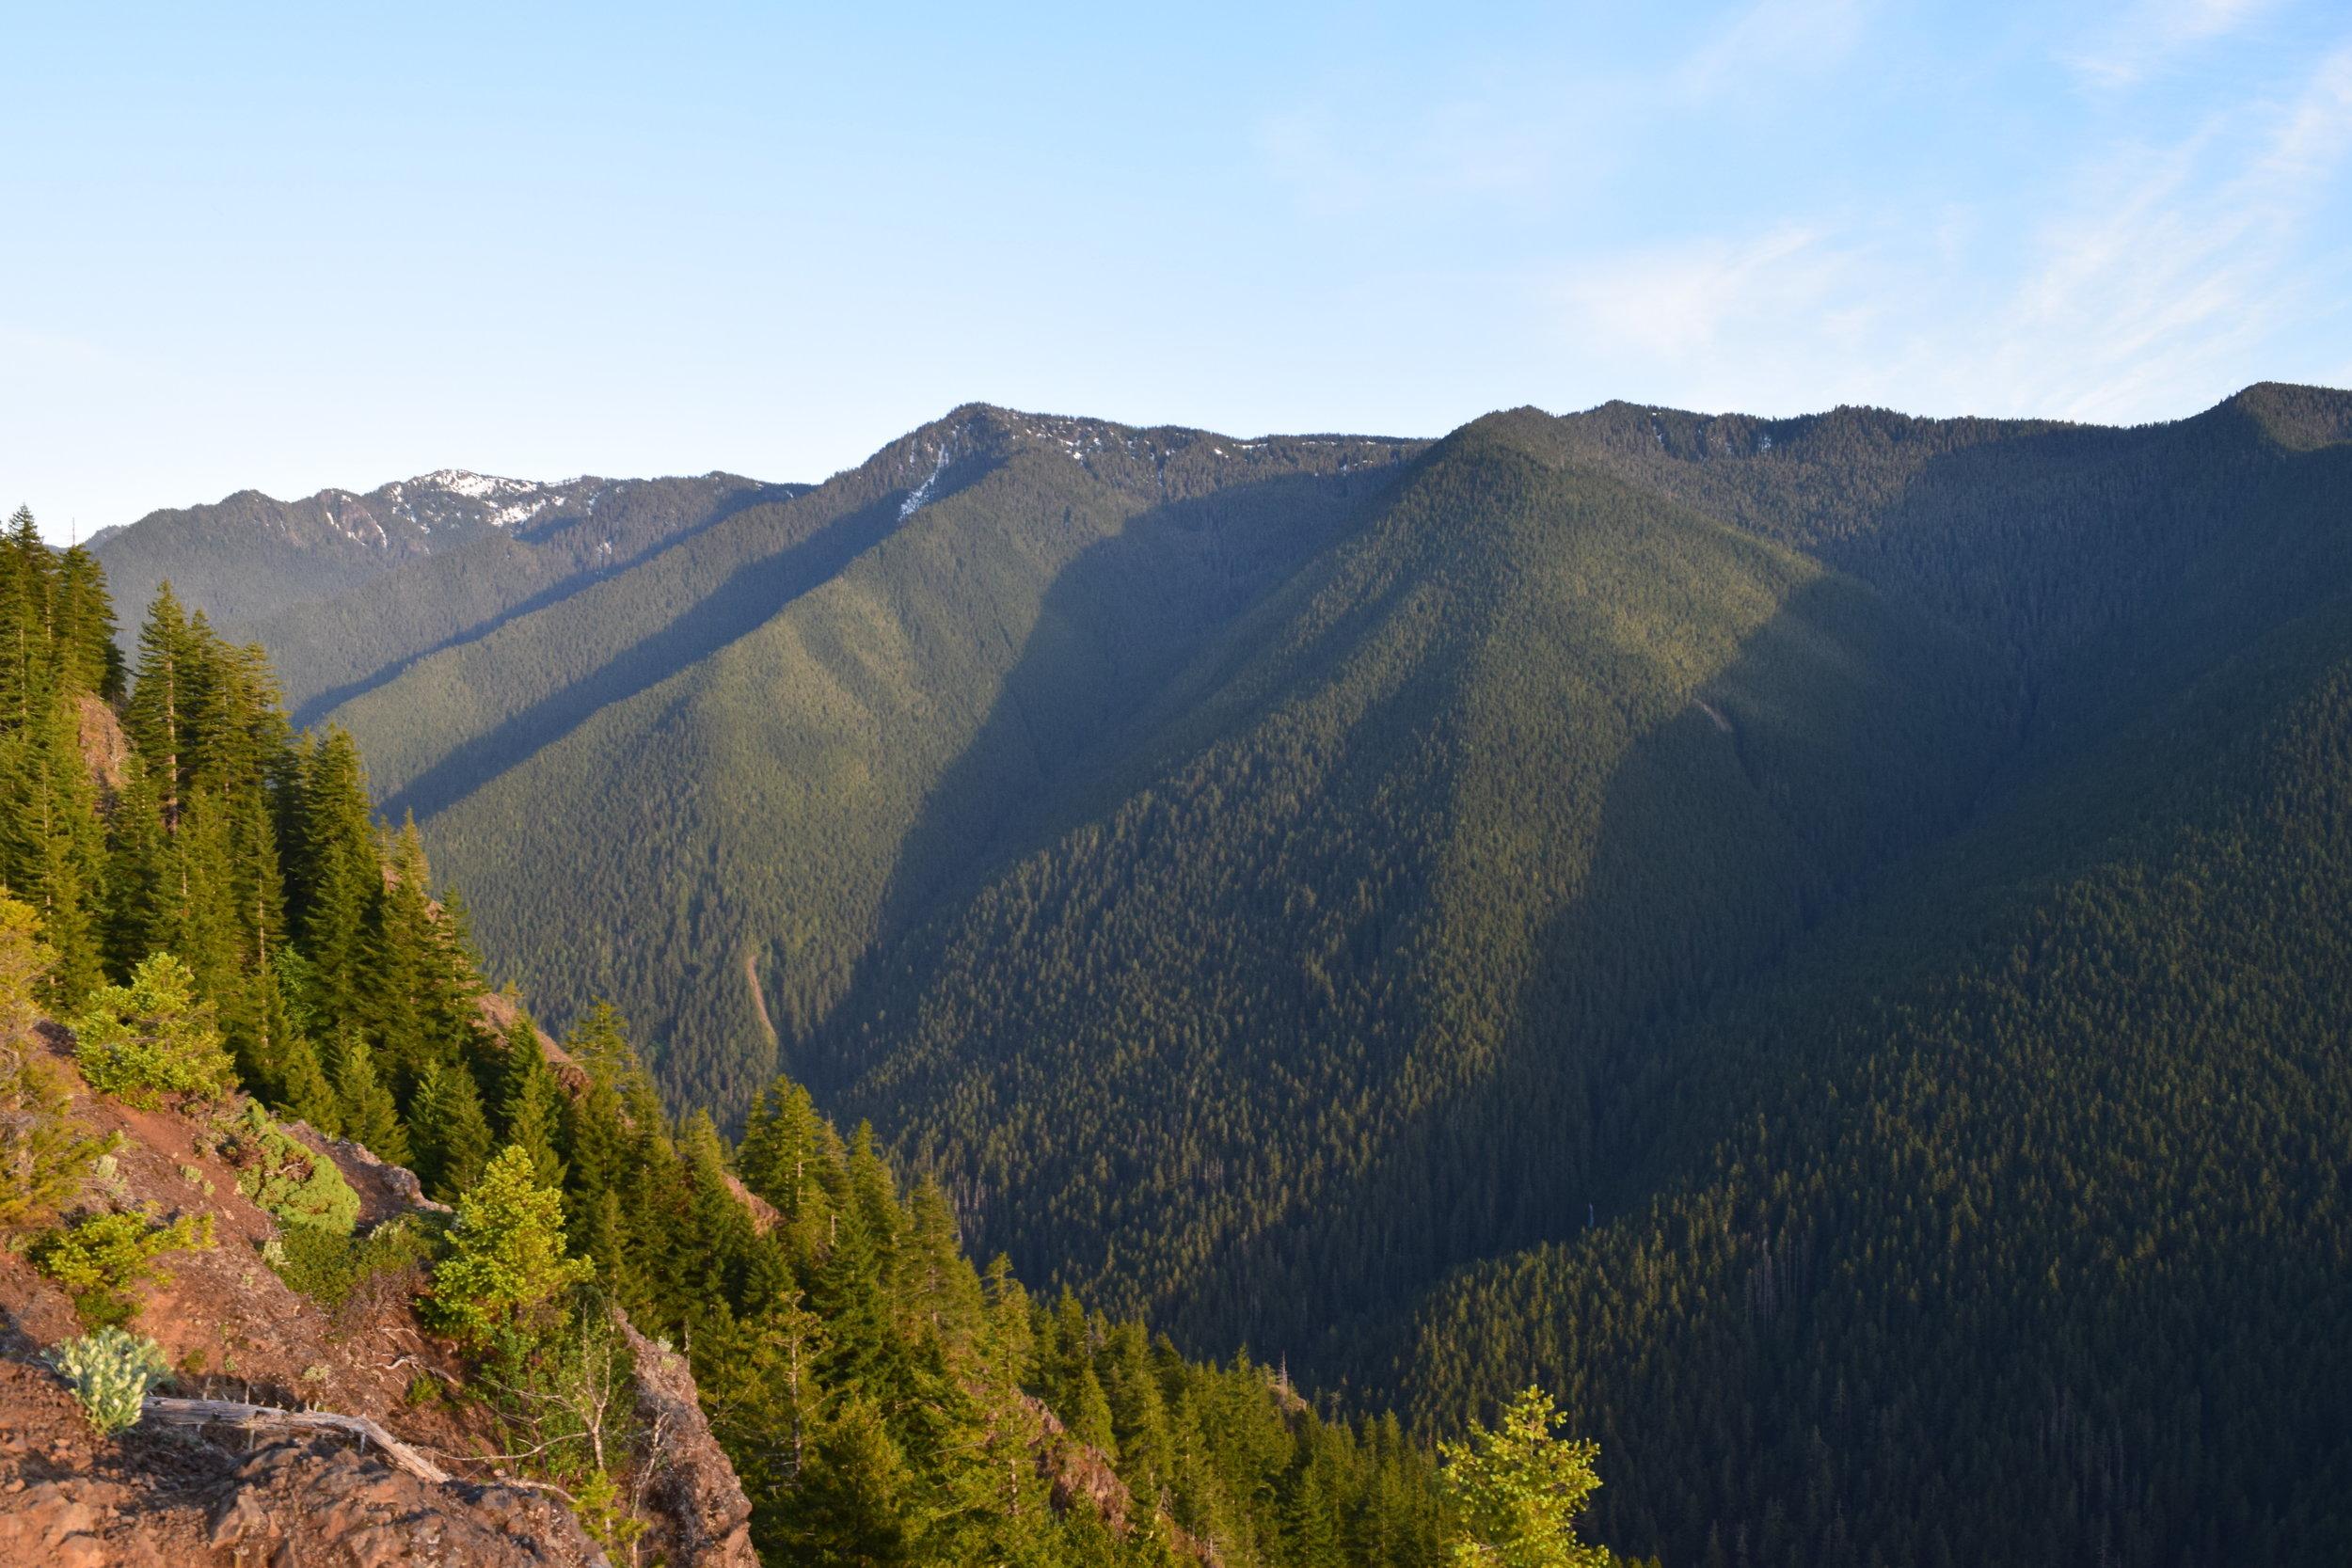 A mountainous backdrop